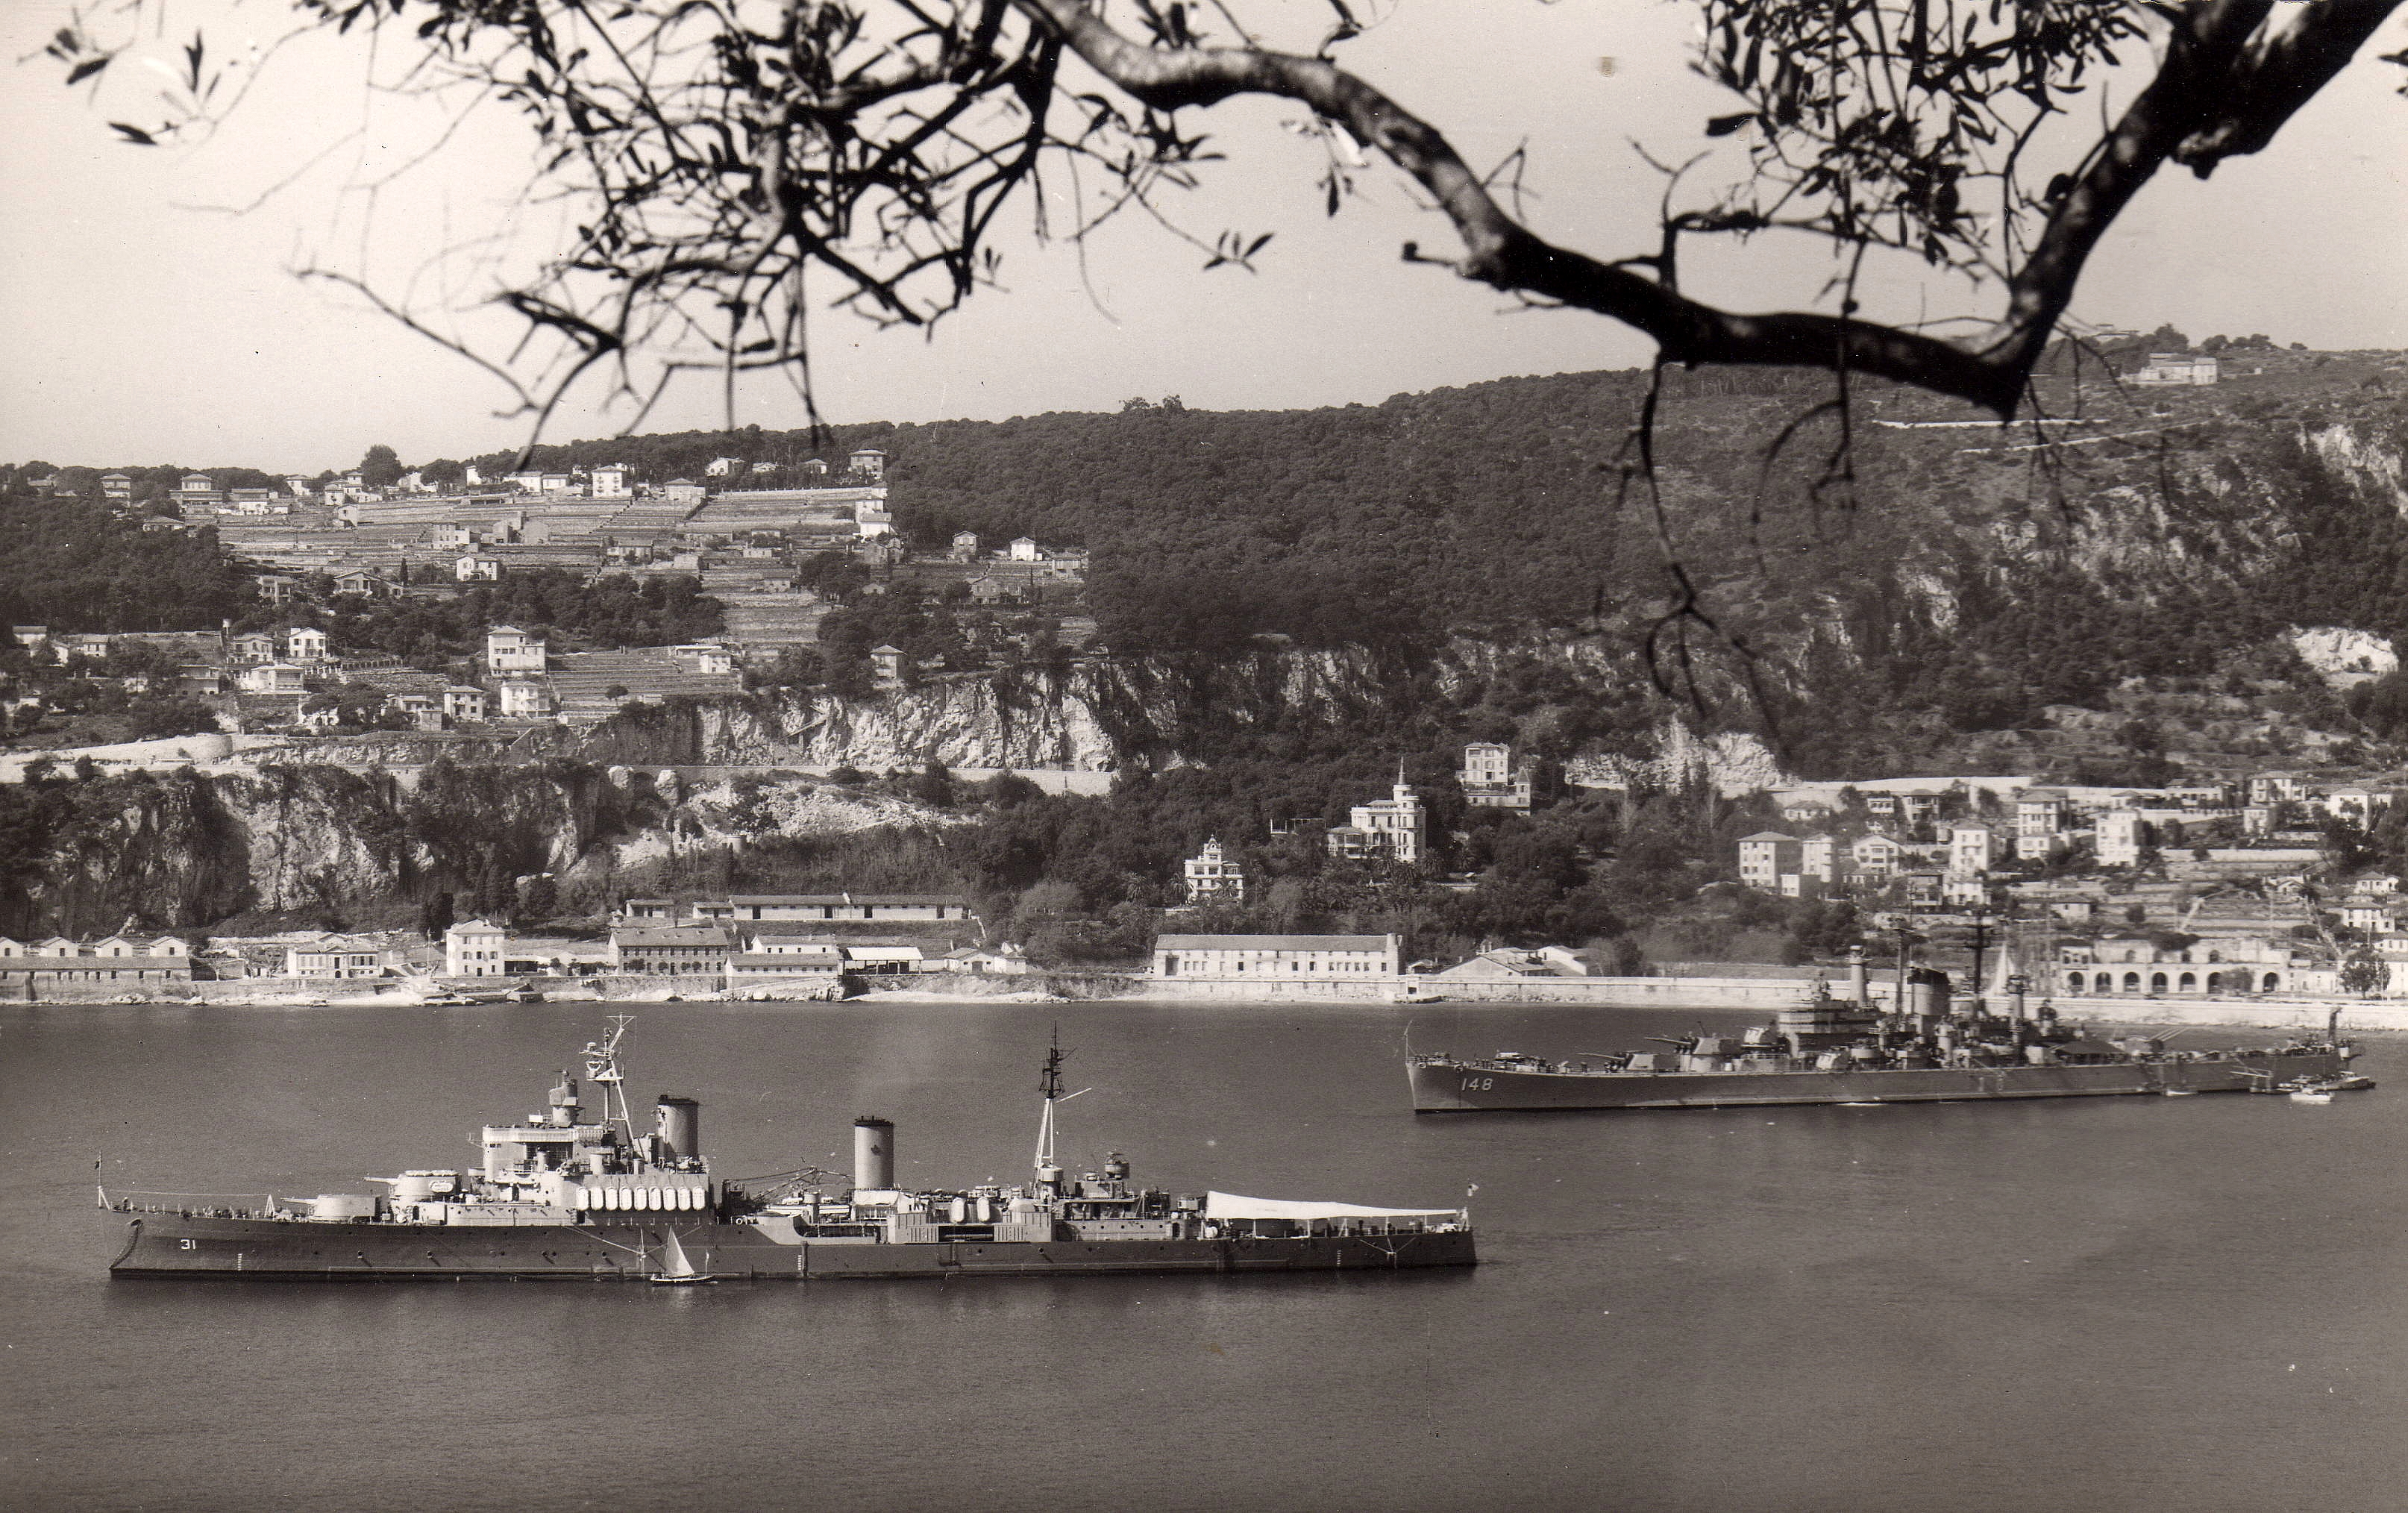 HMCS Québec